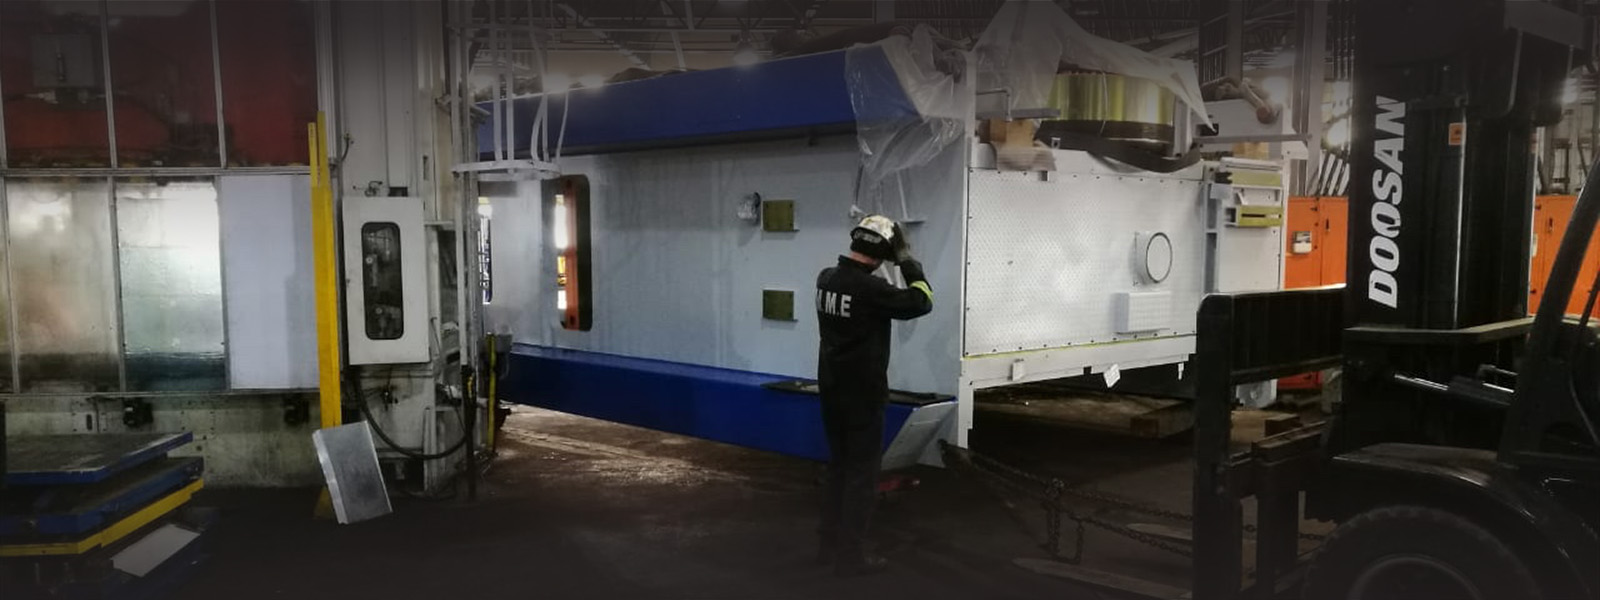 mechanical-services-mme-Machine-Moving-Engineering-experts-machinery-equipment-Gauteng-Kzn